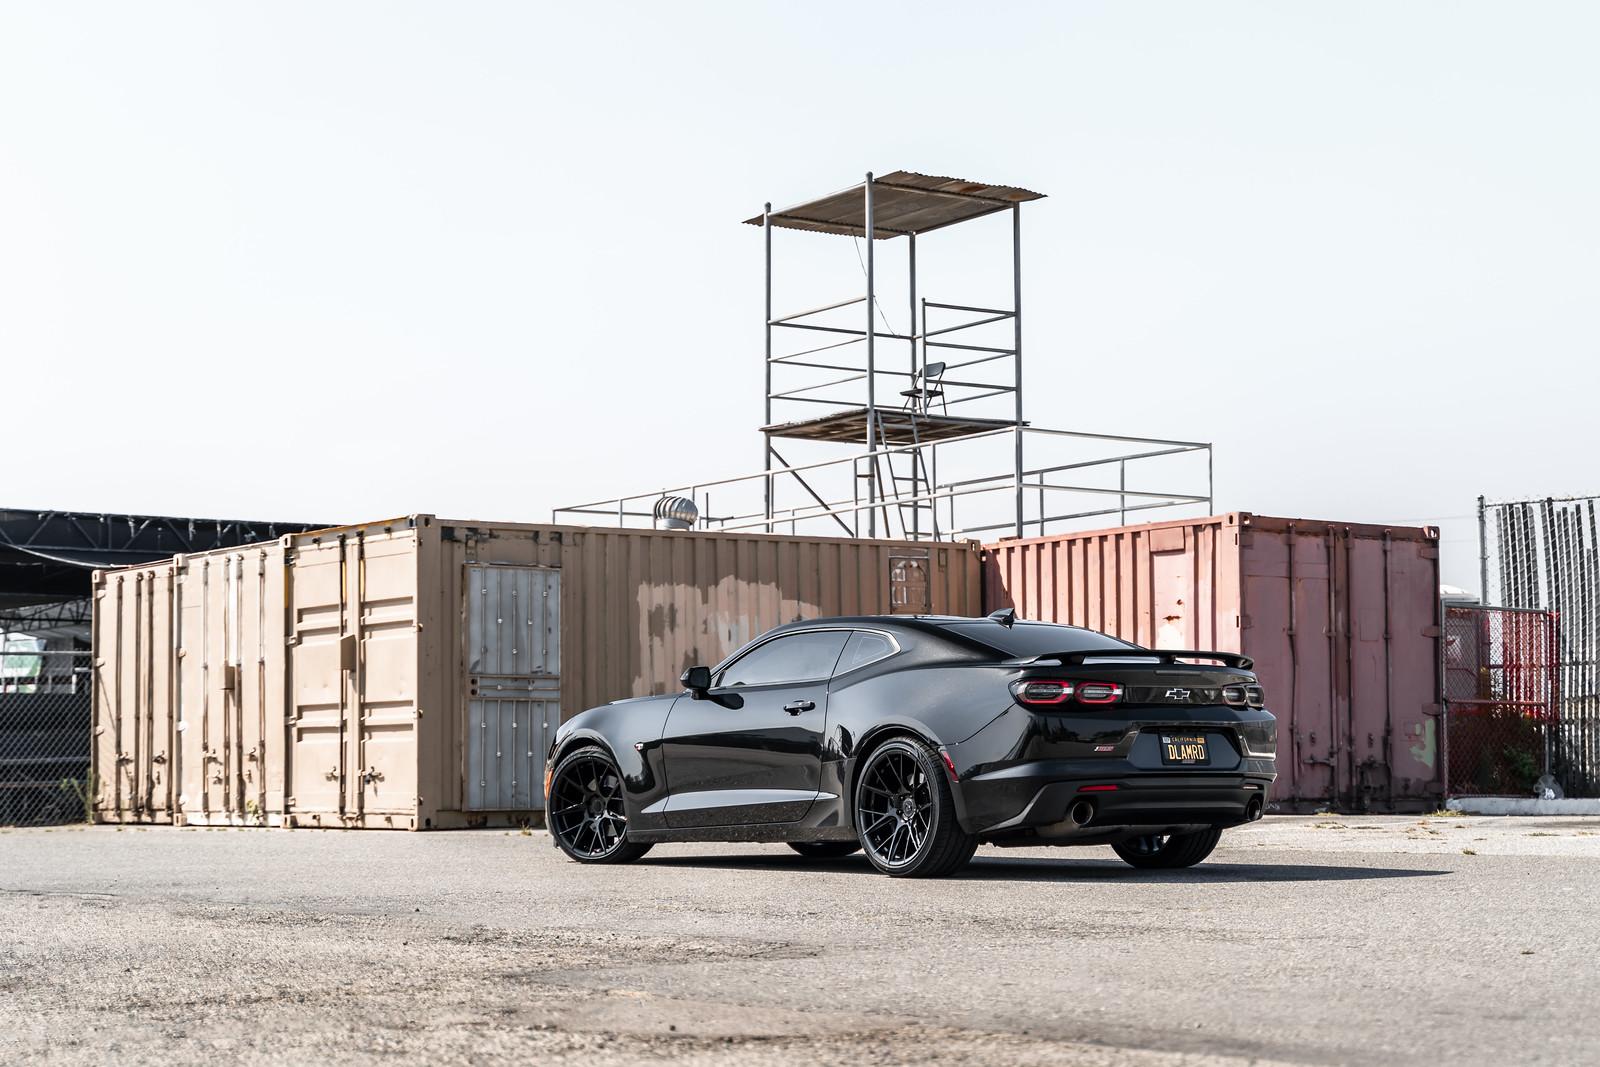 2020_Chevrolet_Camaro_SS_BDF18_Gloss_Black_3